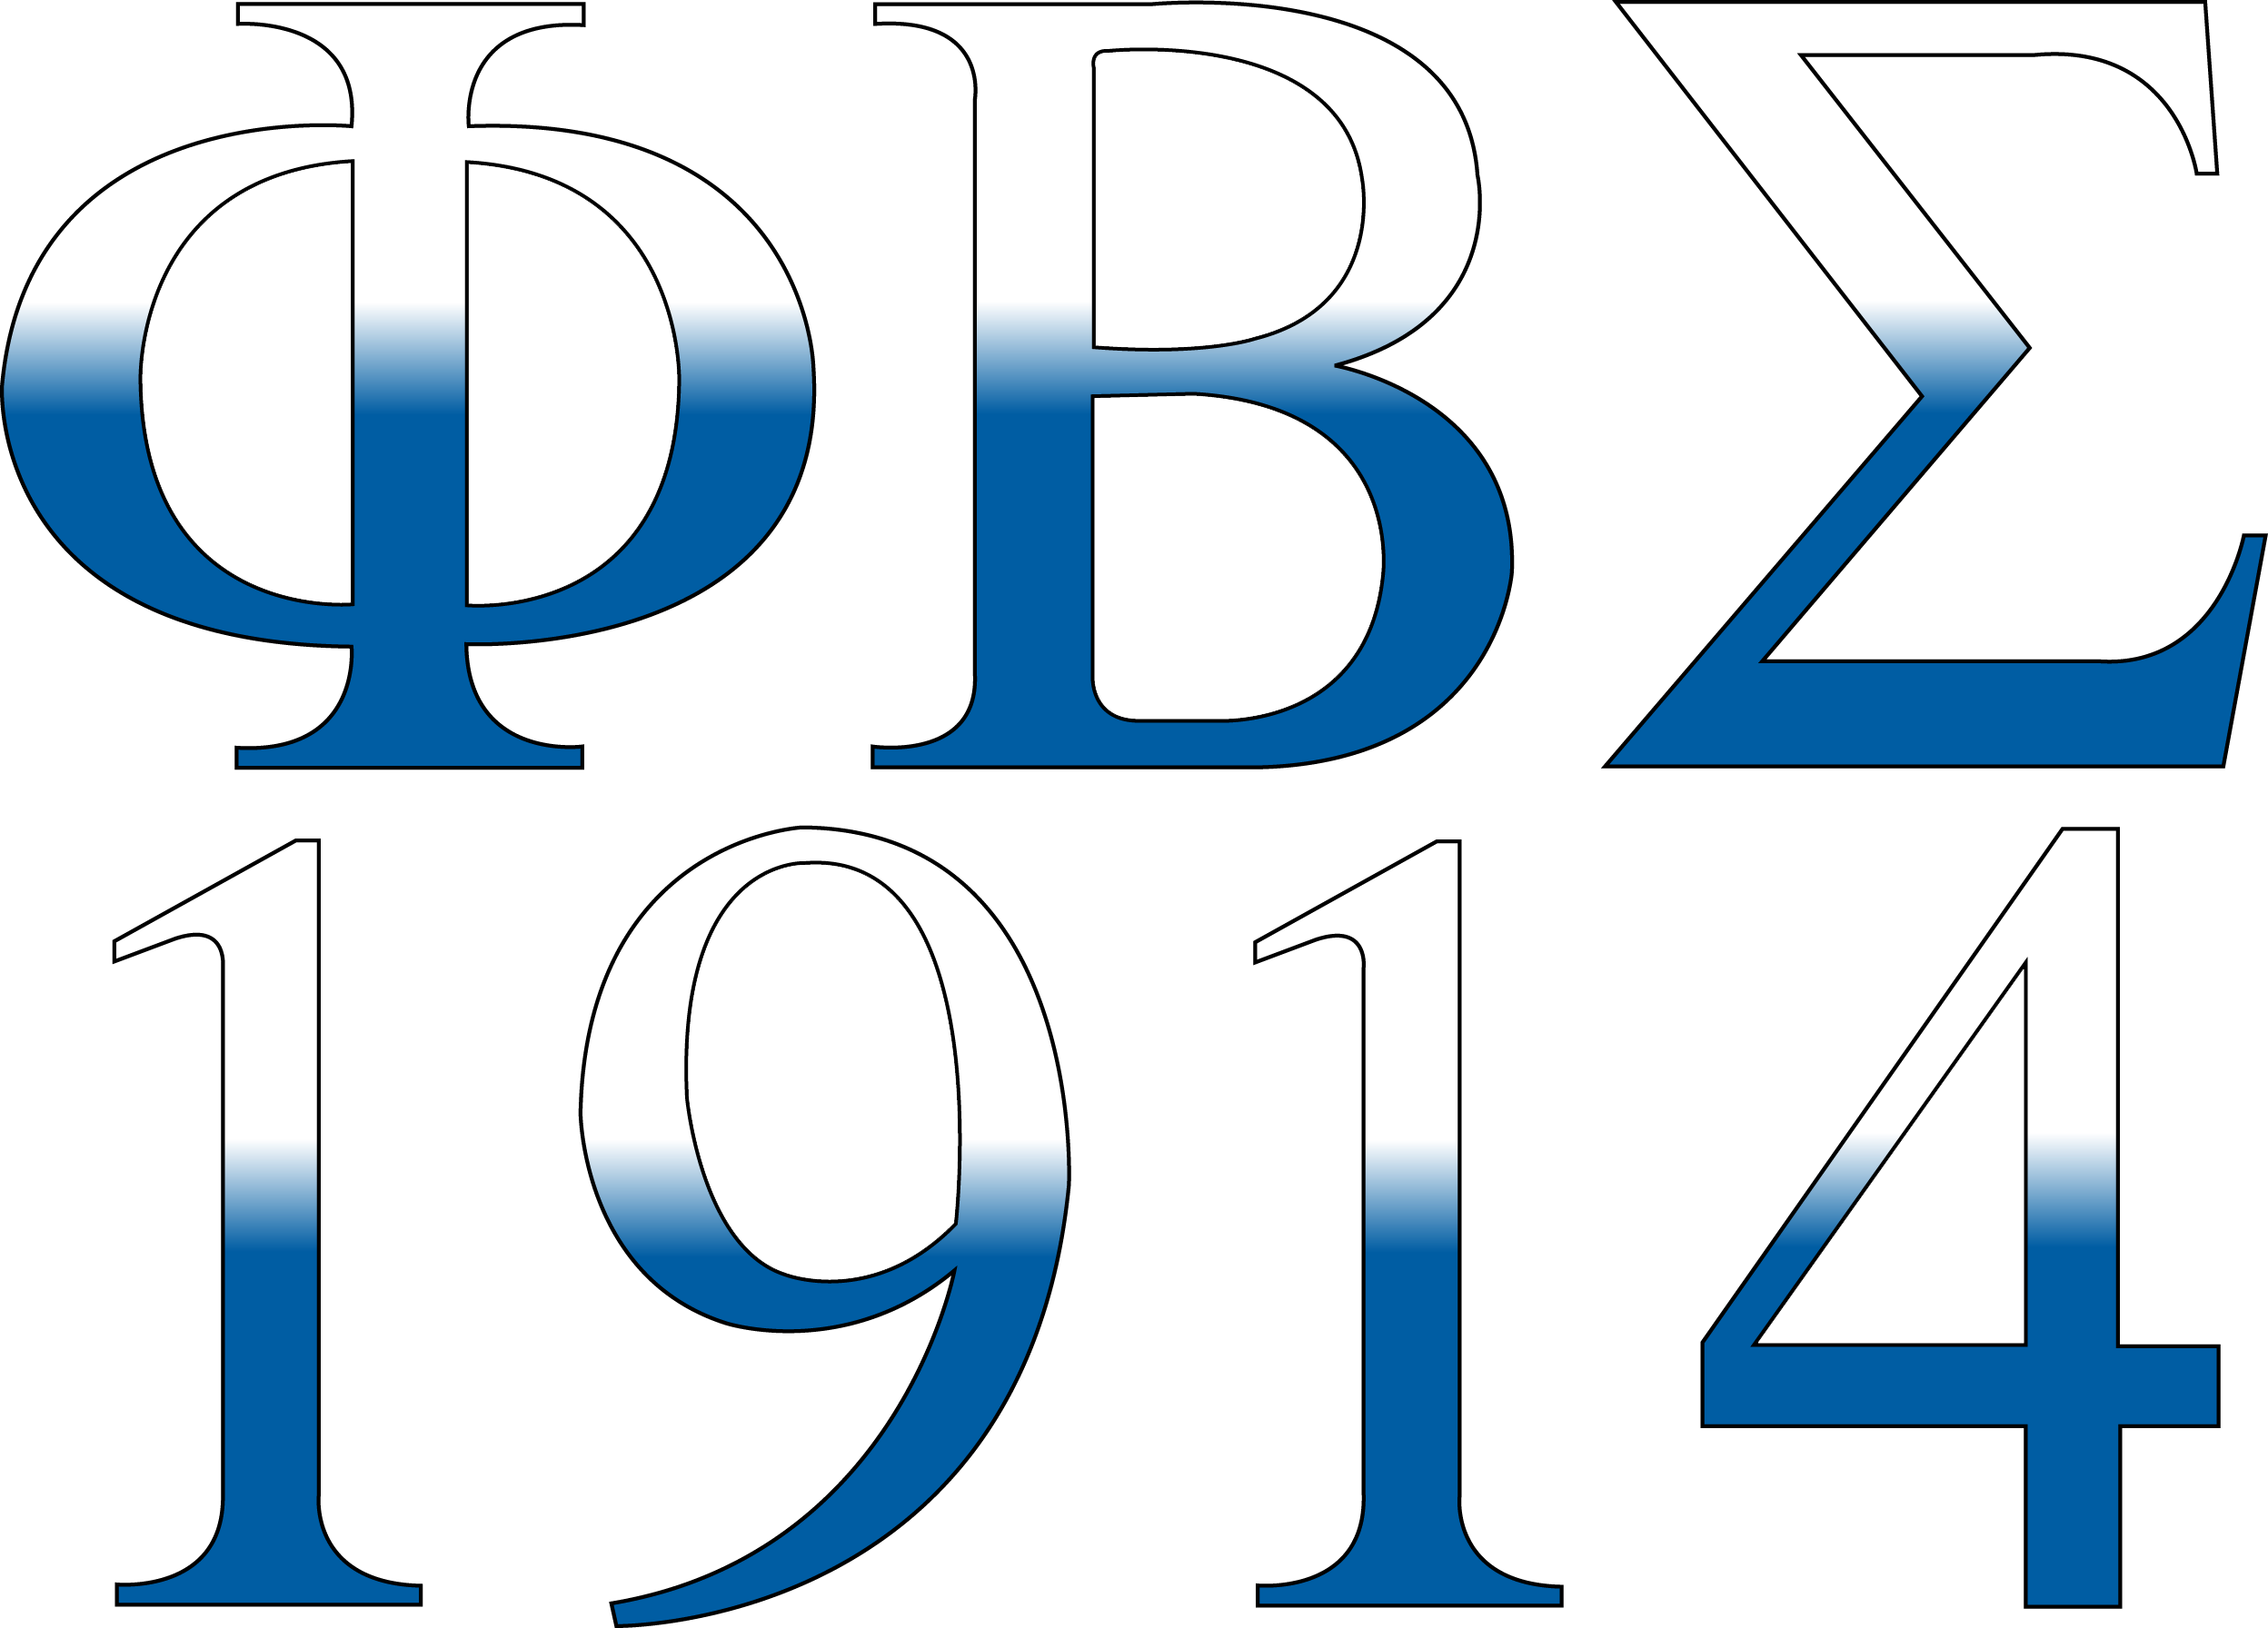 Beta sigma phi clipart 2015 clipart transparent download Phi Beta Sigma Logo free image clipart transparent download